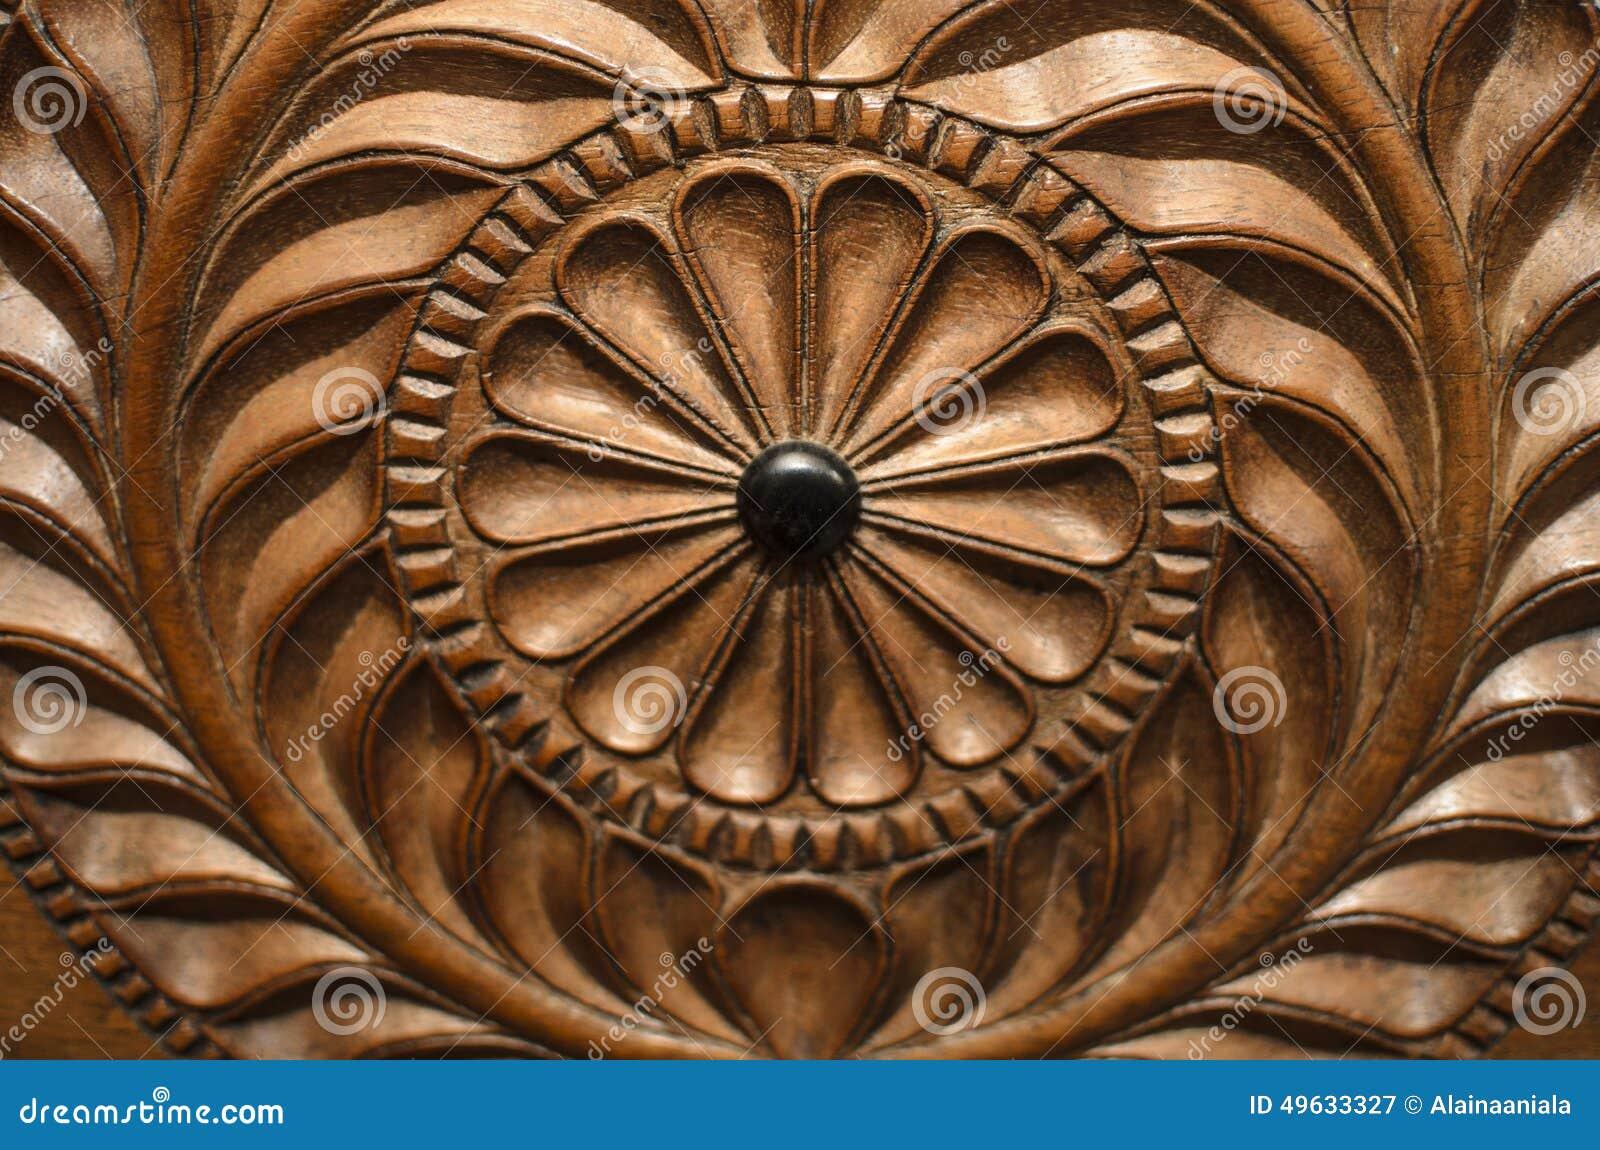 Royalty-Free Stock Photo. Download Ceylon Collection: Wood Carving ... & Ceylon Collection: Wood Carving Stock Photo - Image: 49633327 pillowsntoast.com